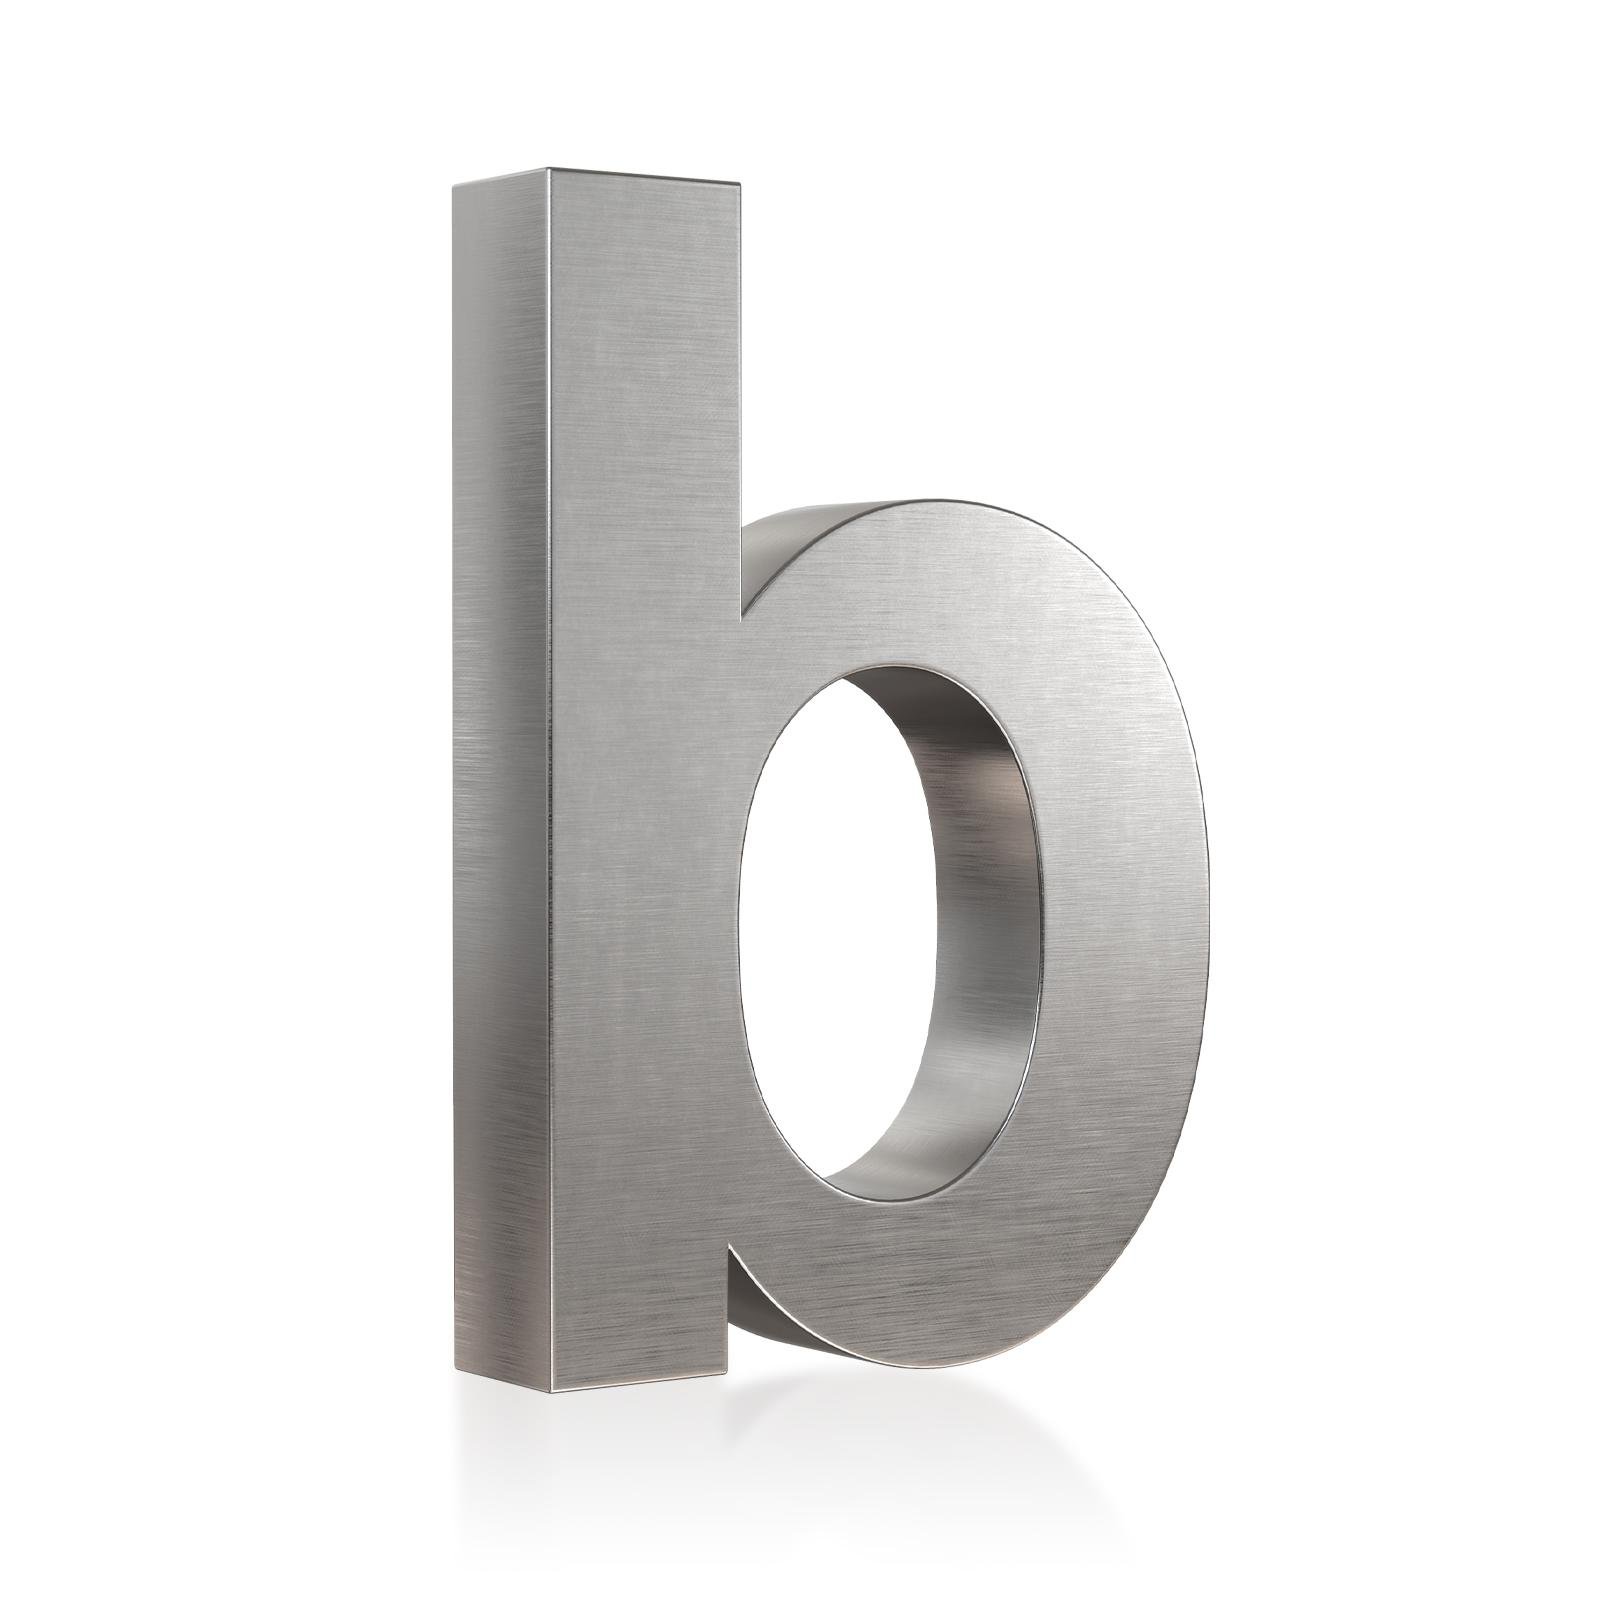 3D Hausnummer b Edelstahl in 3D Design Arial V2A